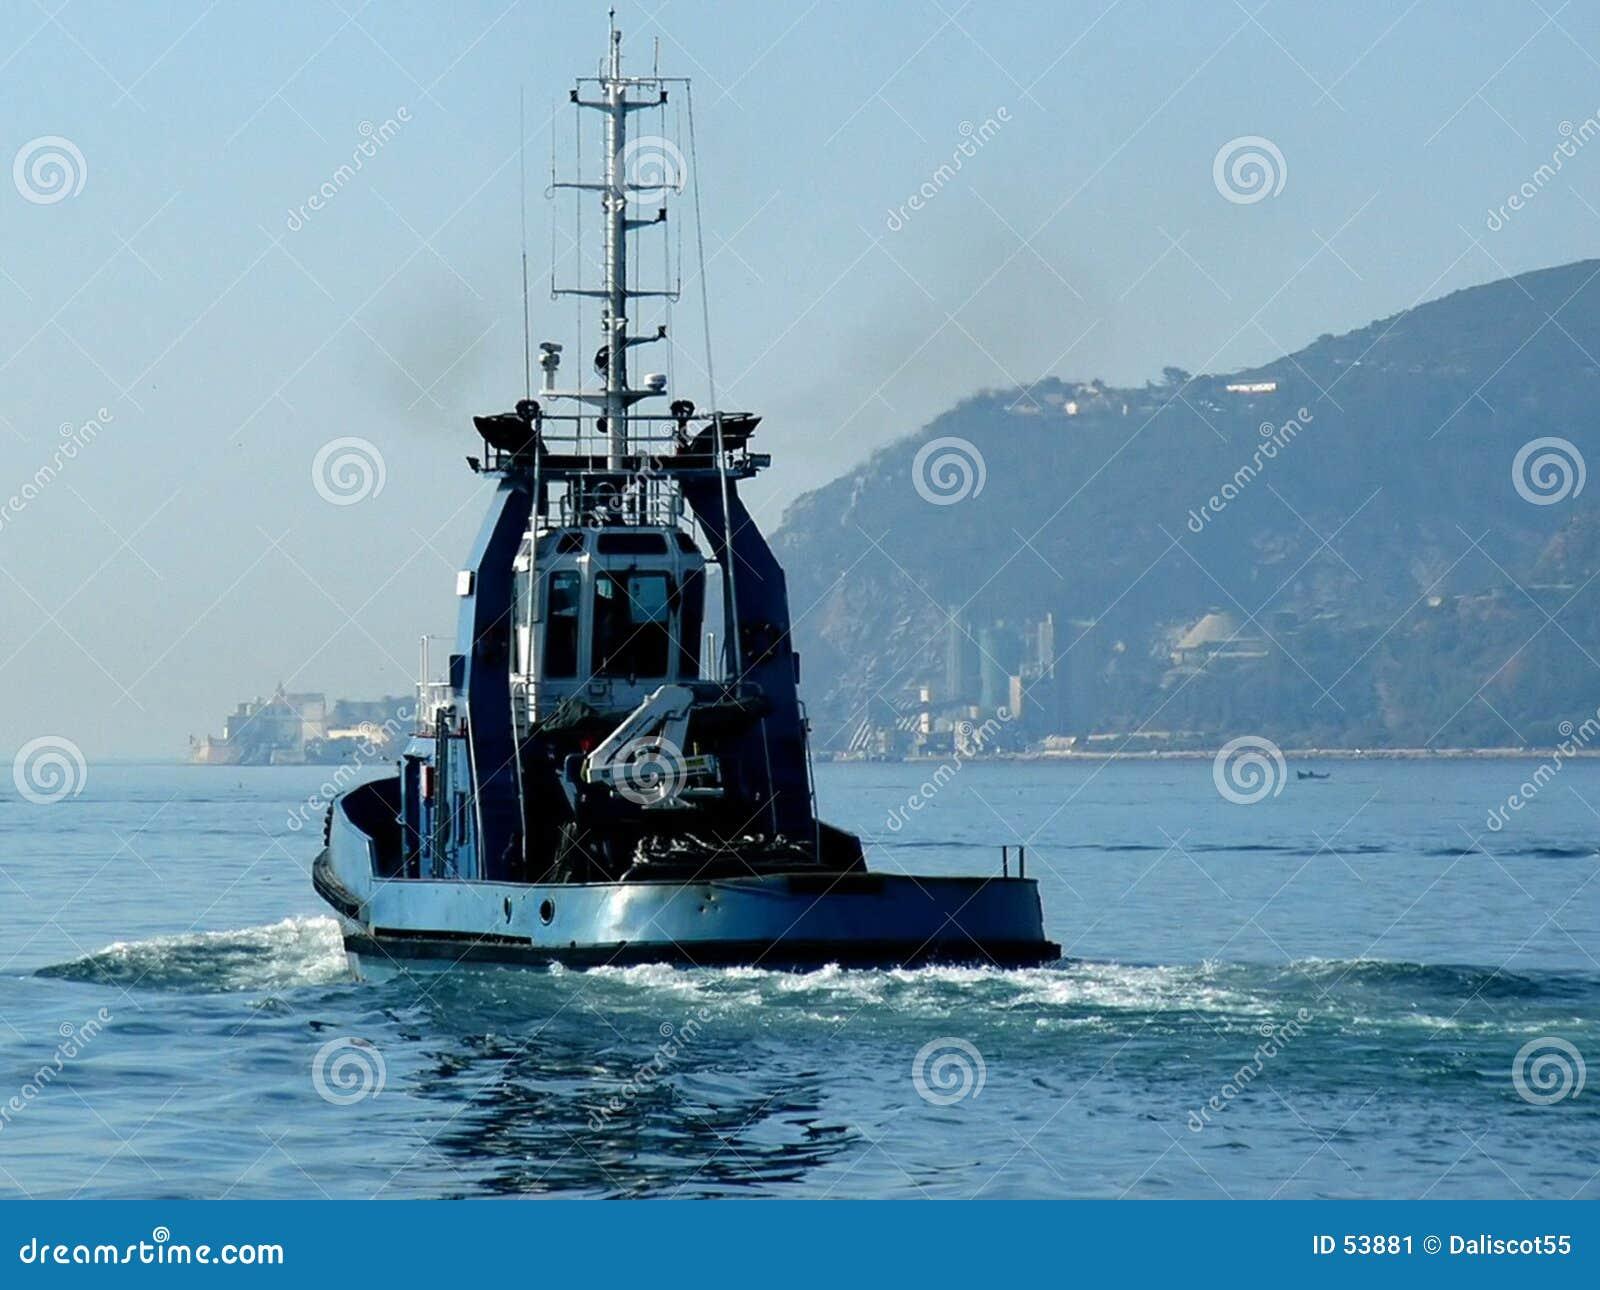 Tug to Sea